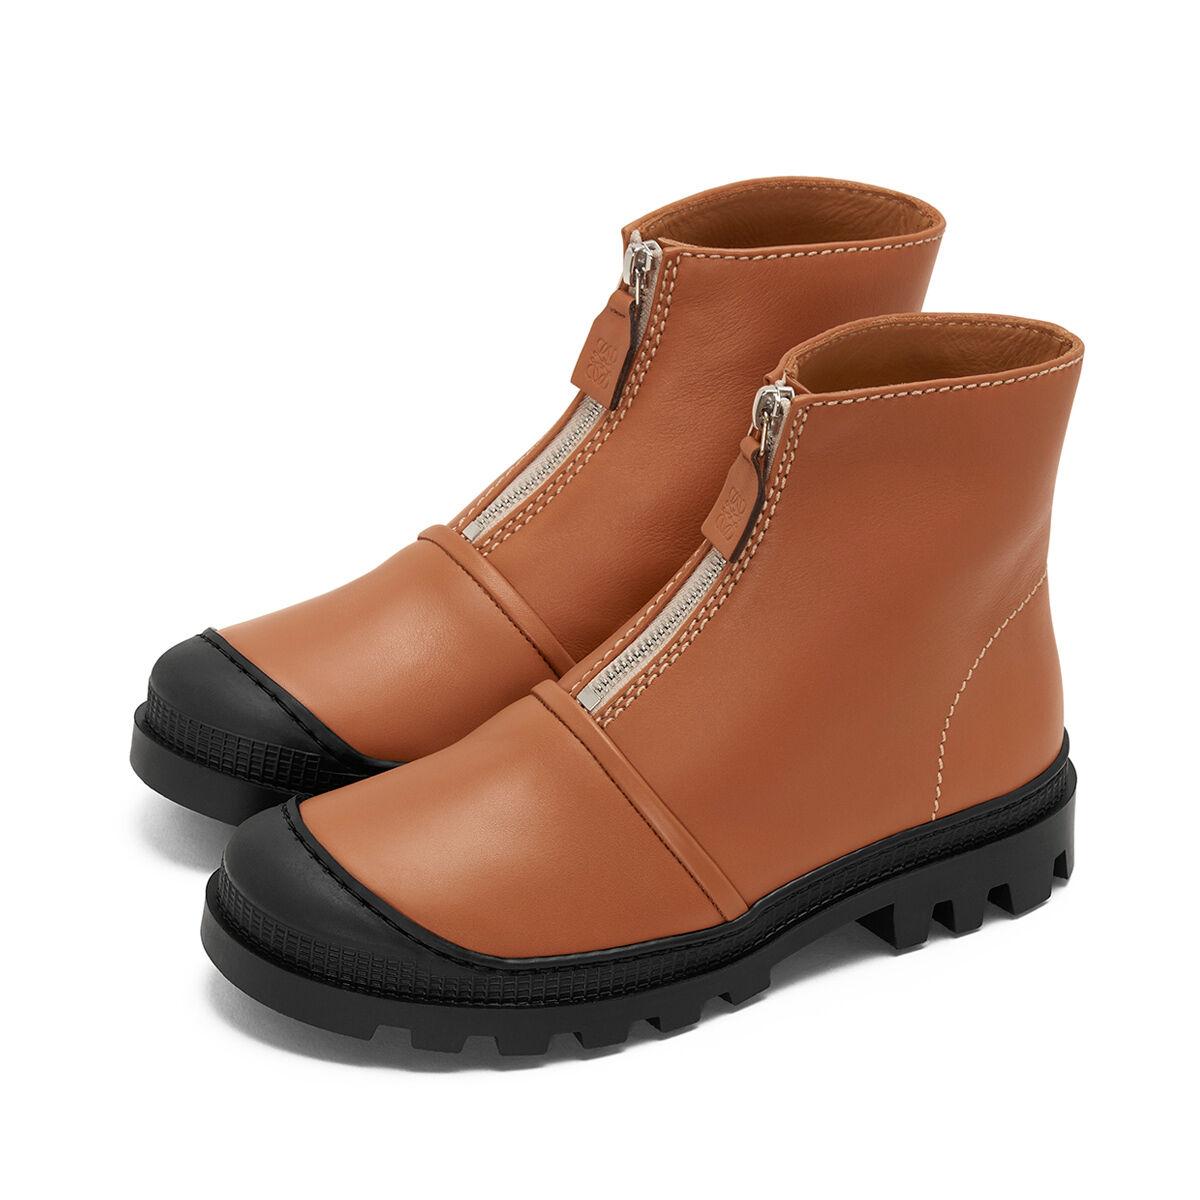 LOEWE Zip Boot 棕色 all